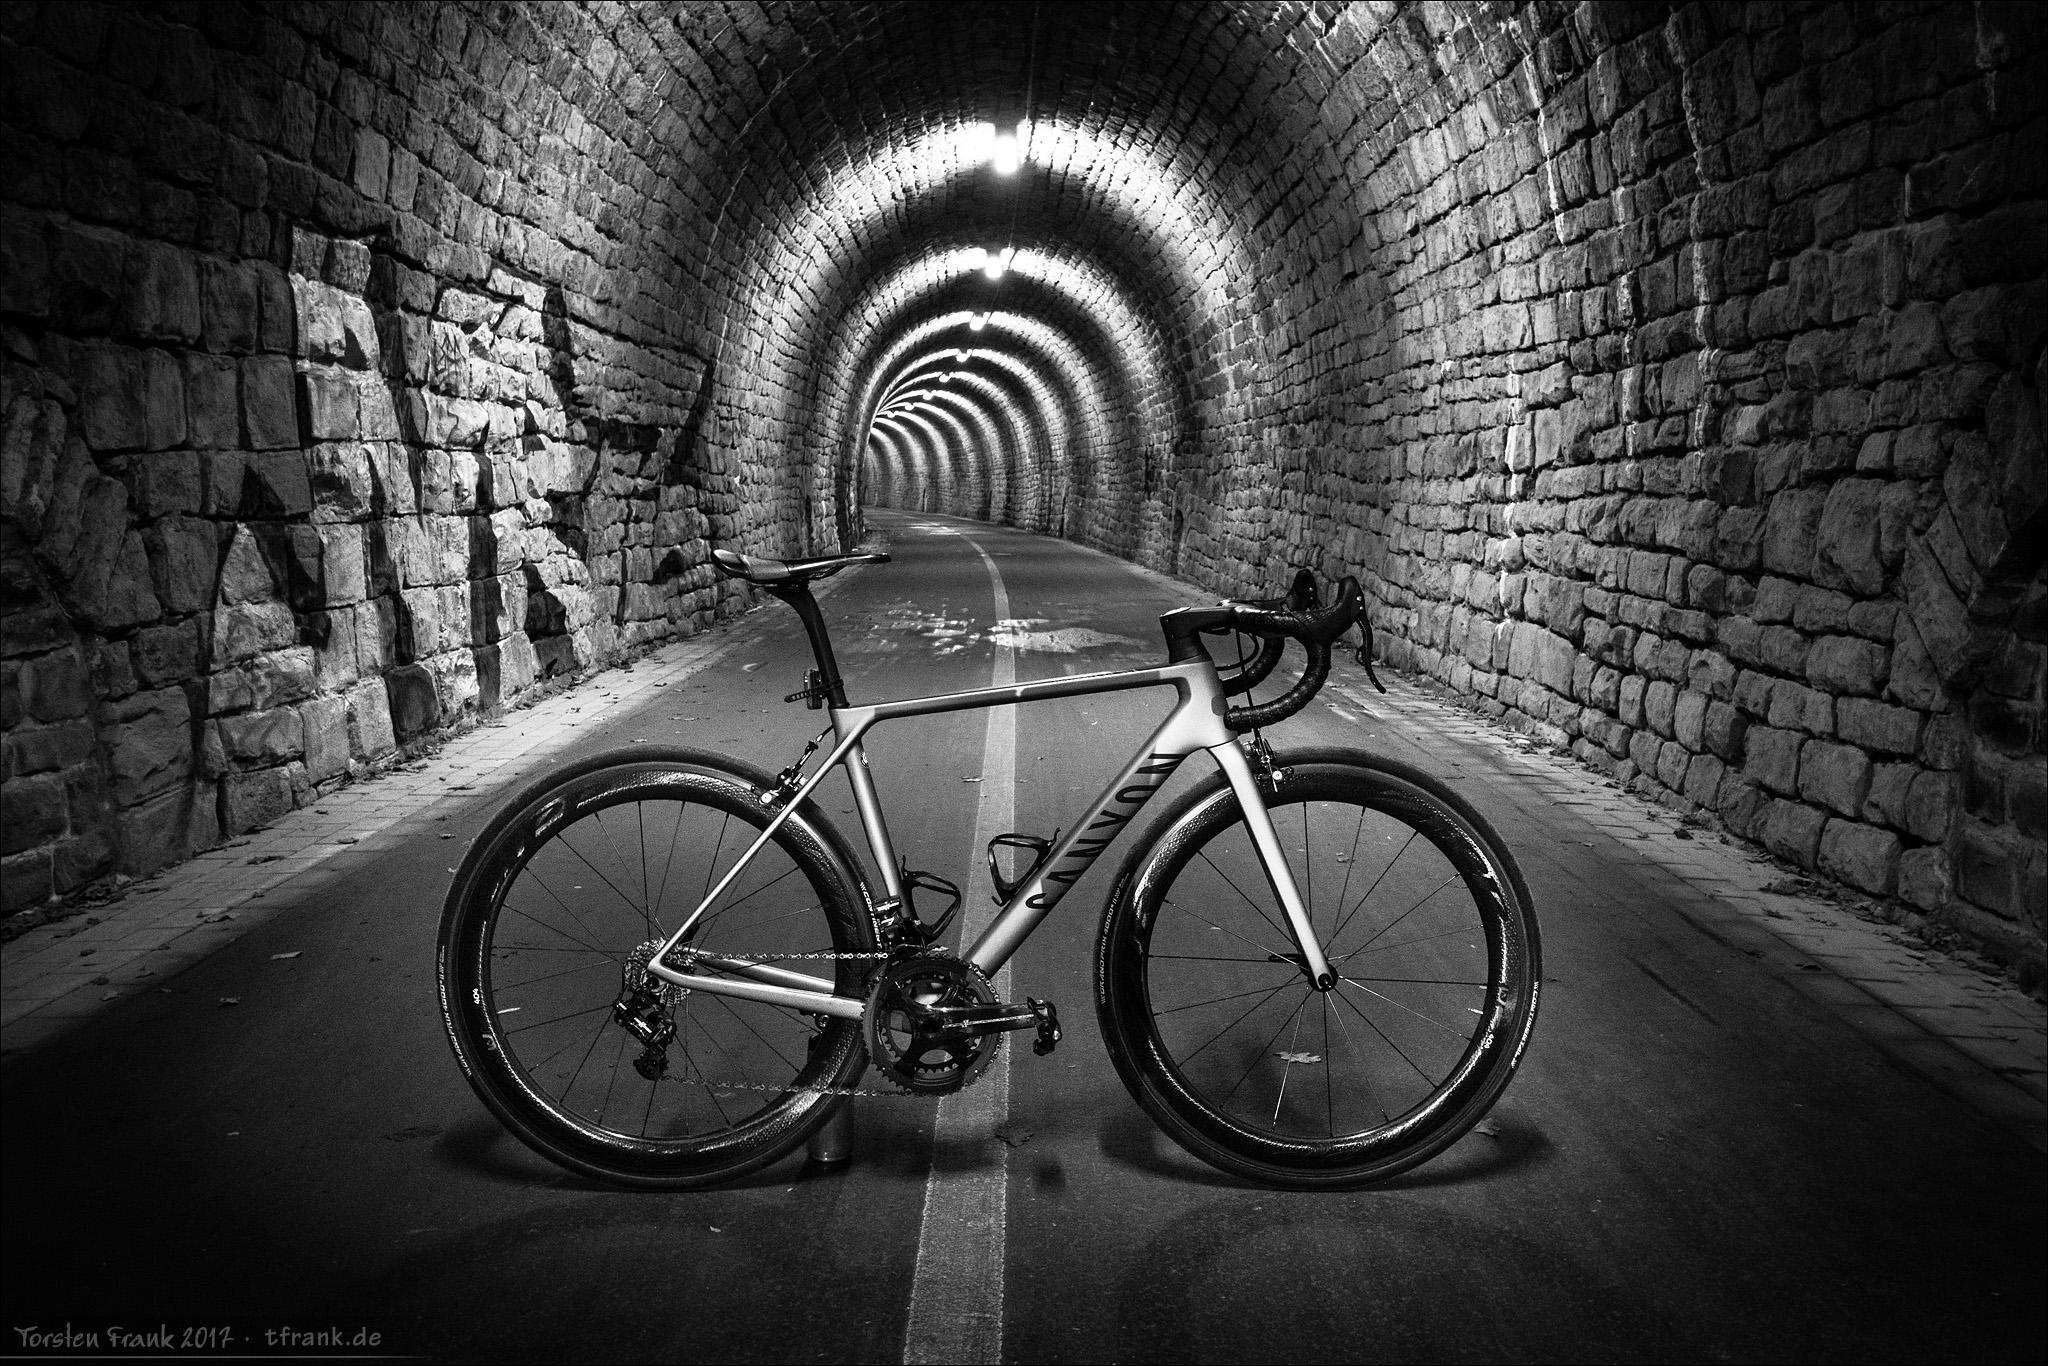 Wallpaper Canyon Tunnel Cycling Angle 404 Light Bike